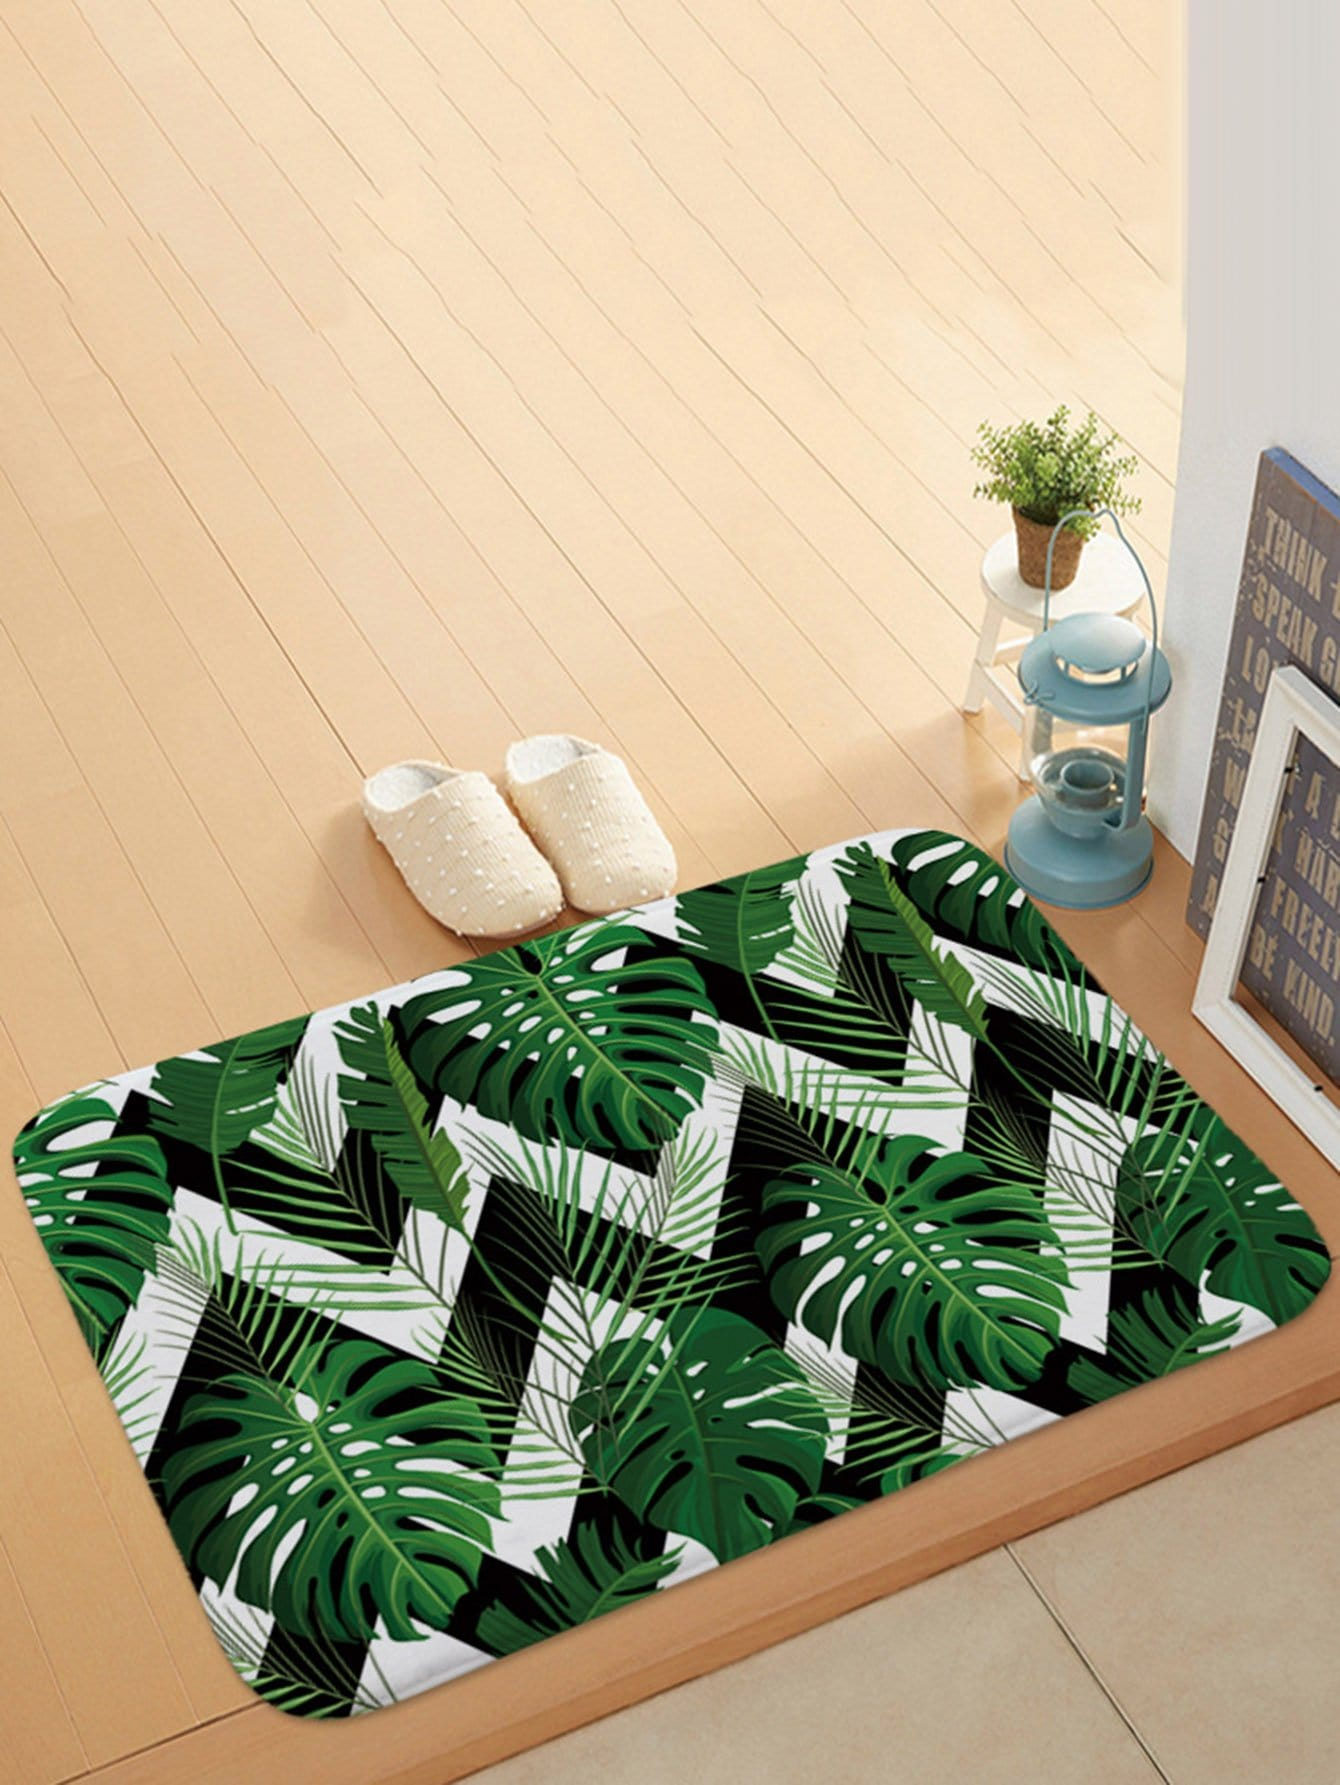 Zigzag & Tropical Print Door Mat